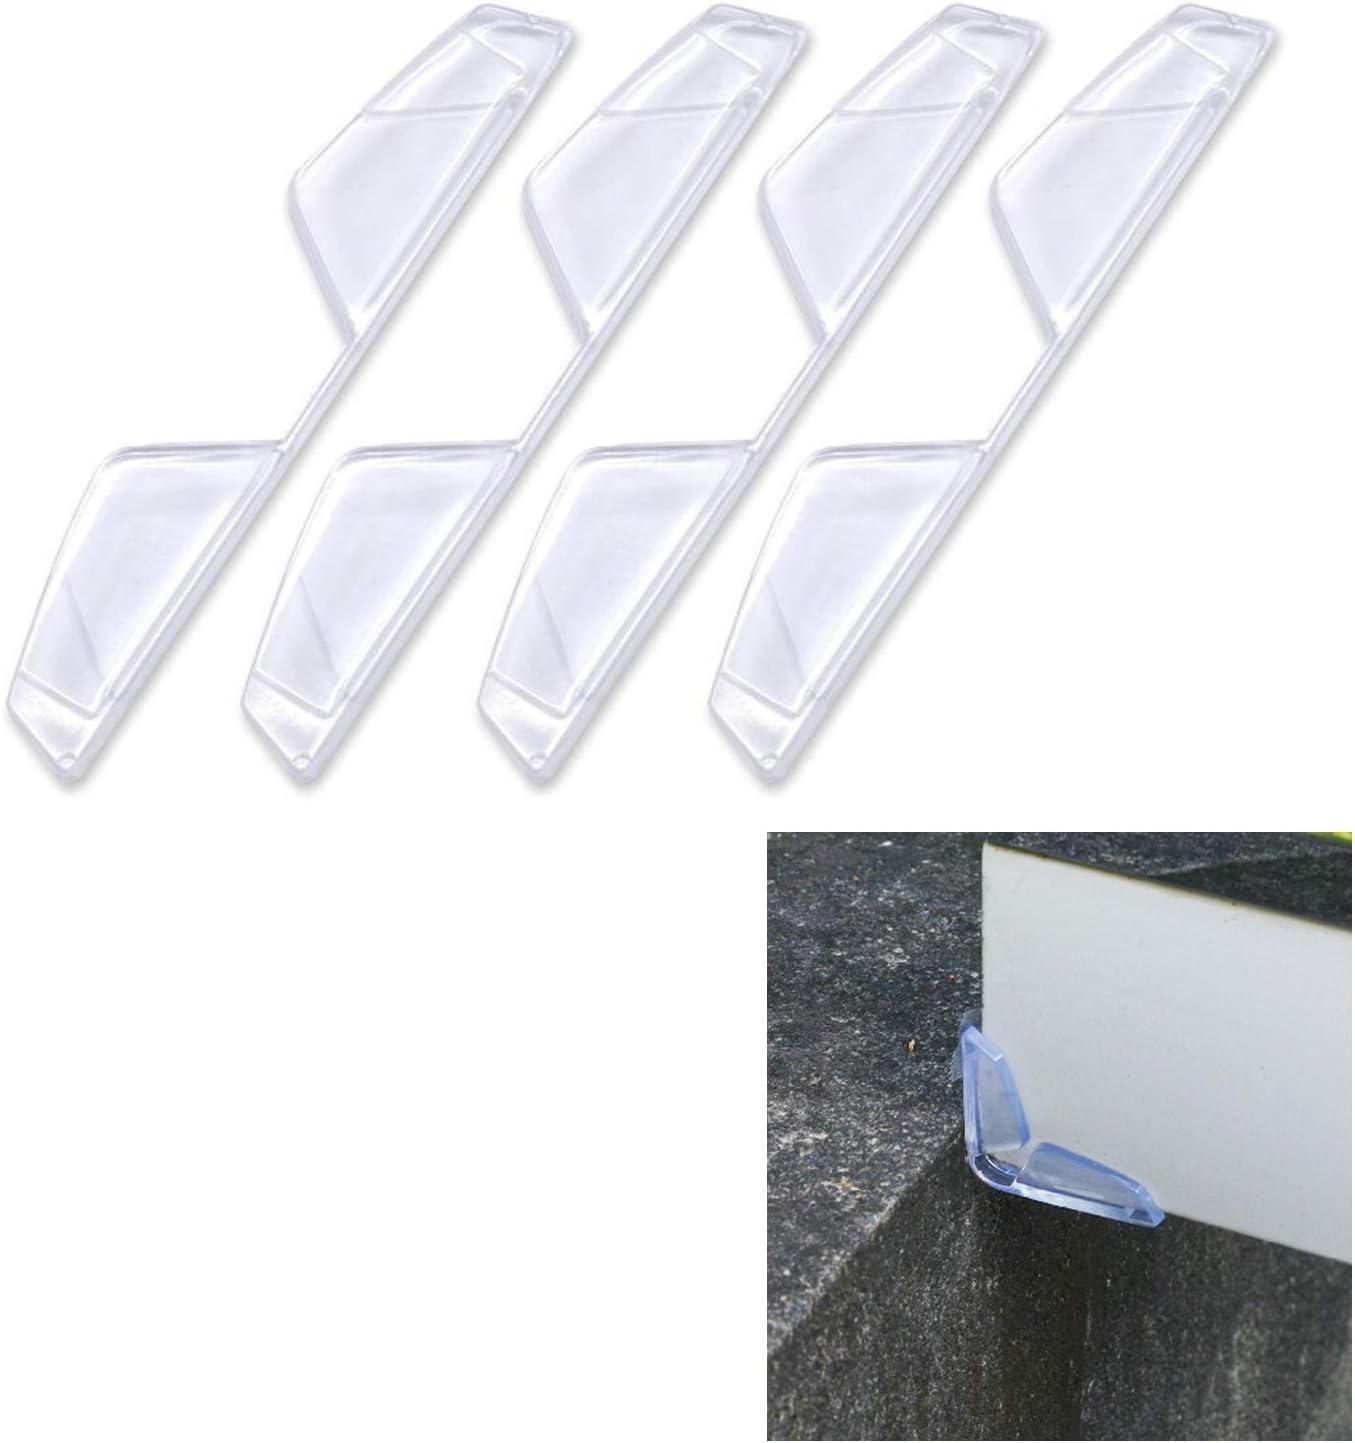 Hypersonic Car Door Edge Guards Protector Universal Clear Corner Bumper 4PCS